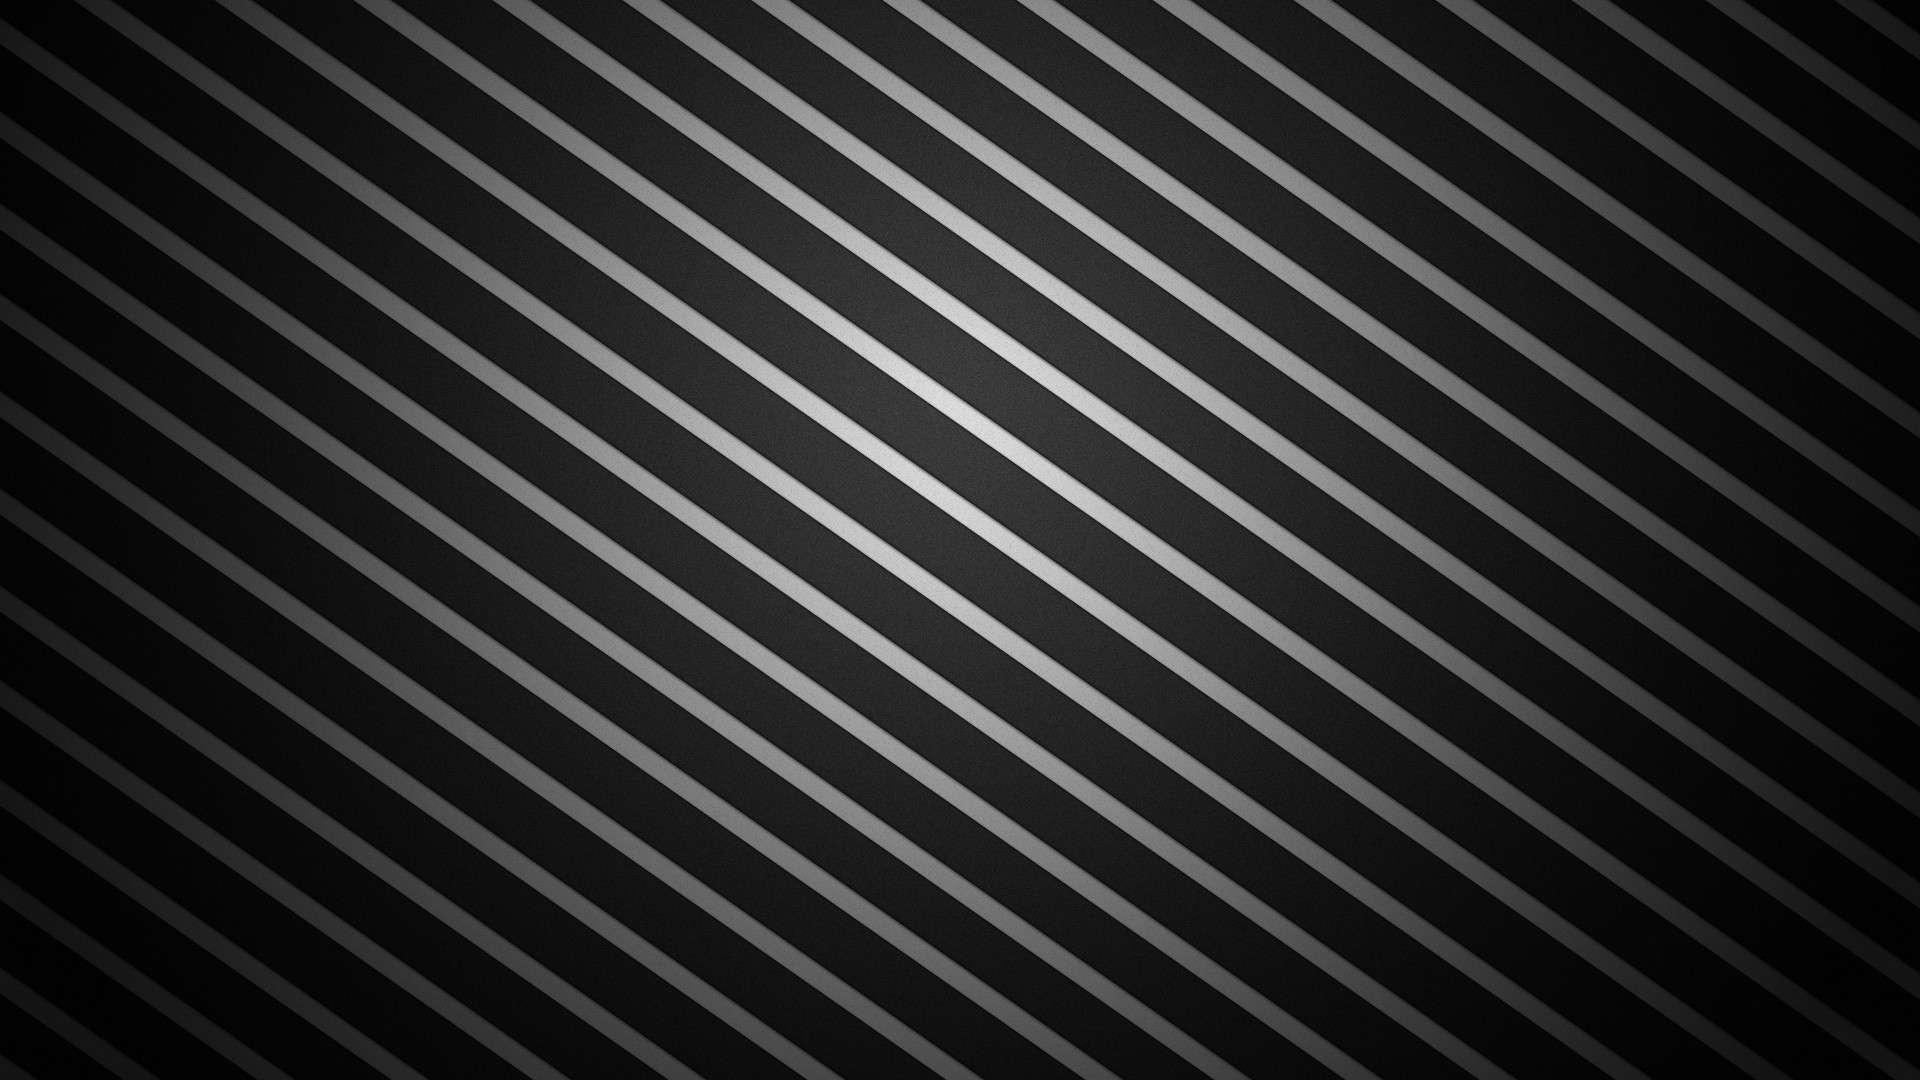 48 black and white 1080p wallpaper on wallpapersafari - White background 1920x1080 ...